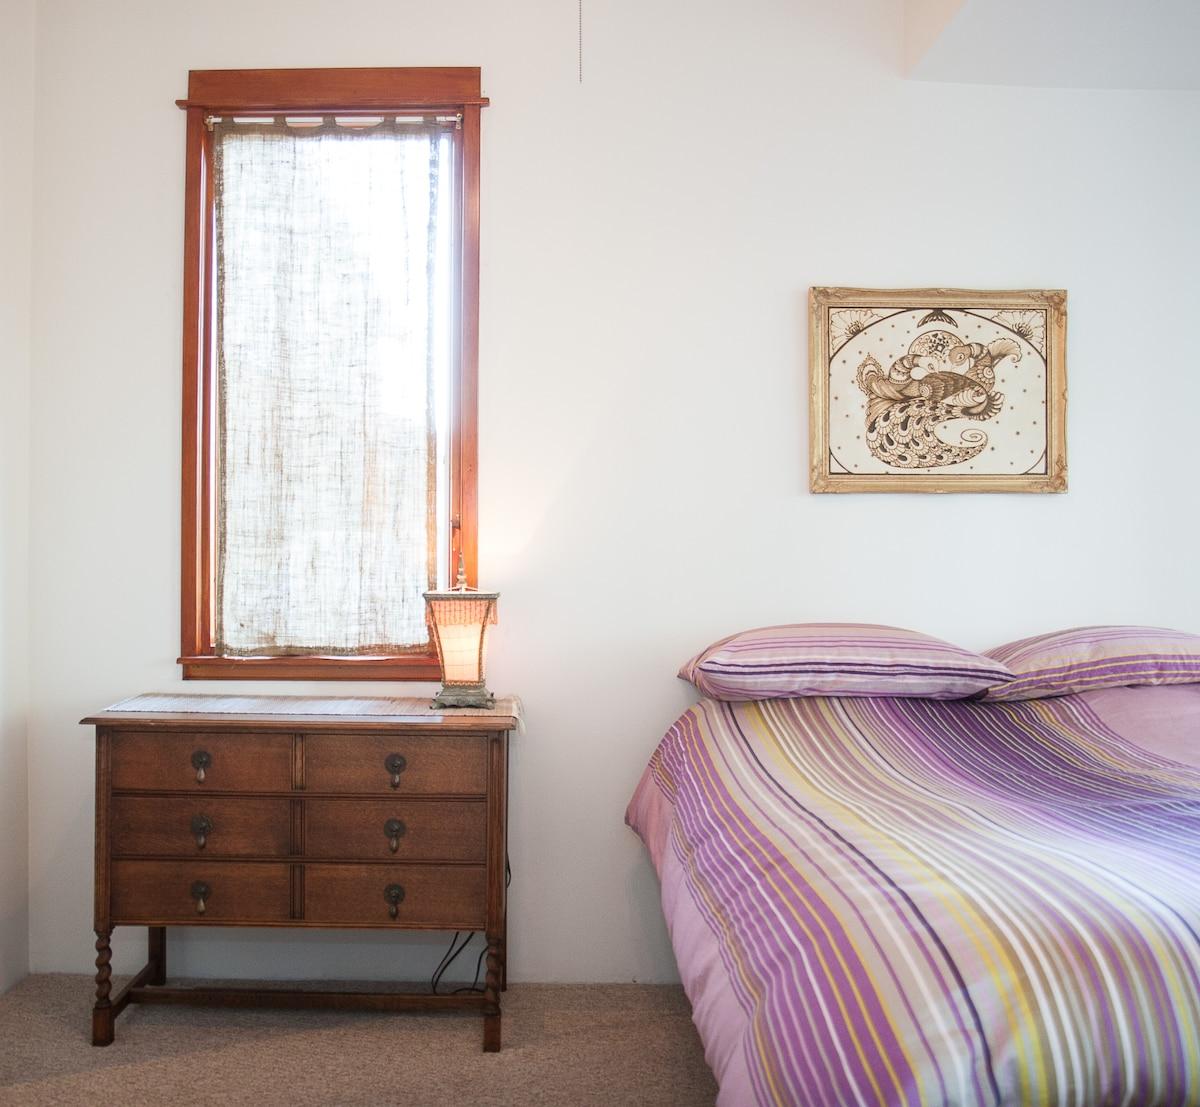 North window in the bedroom.